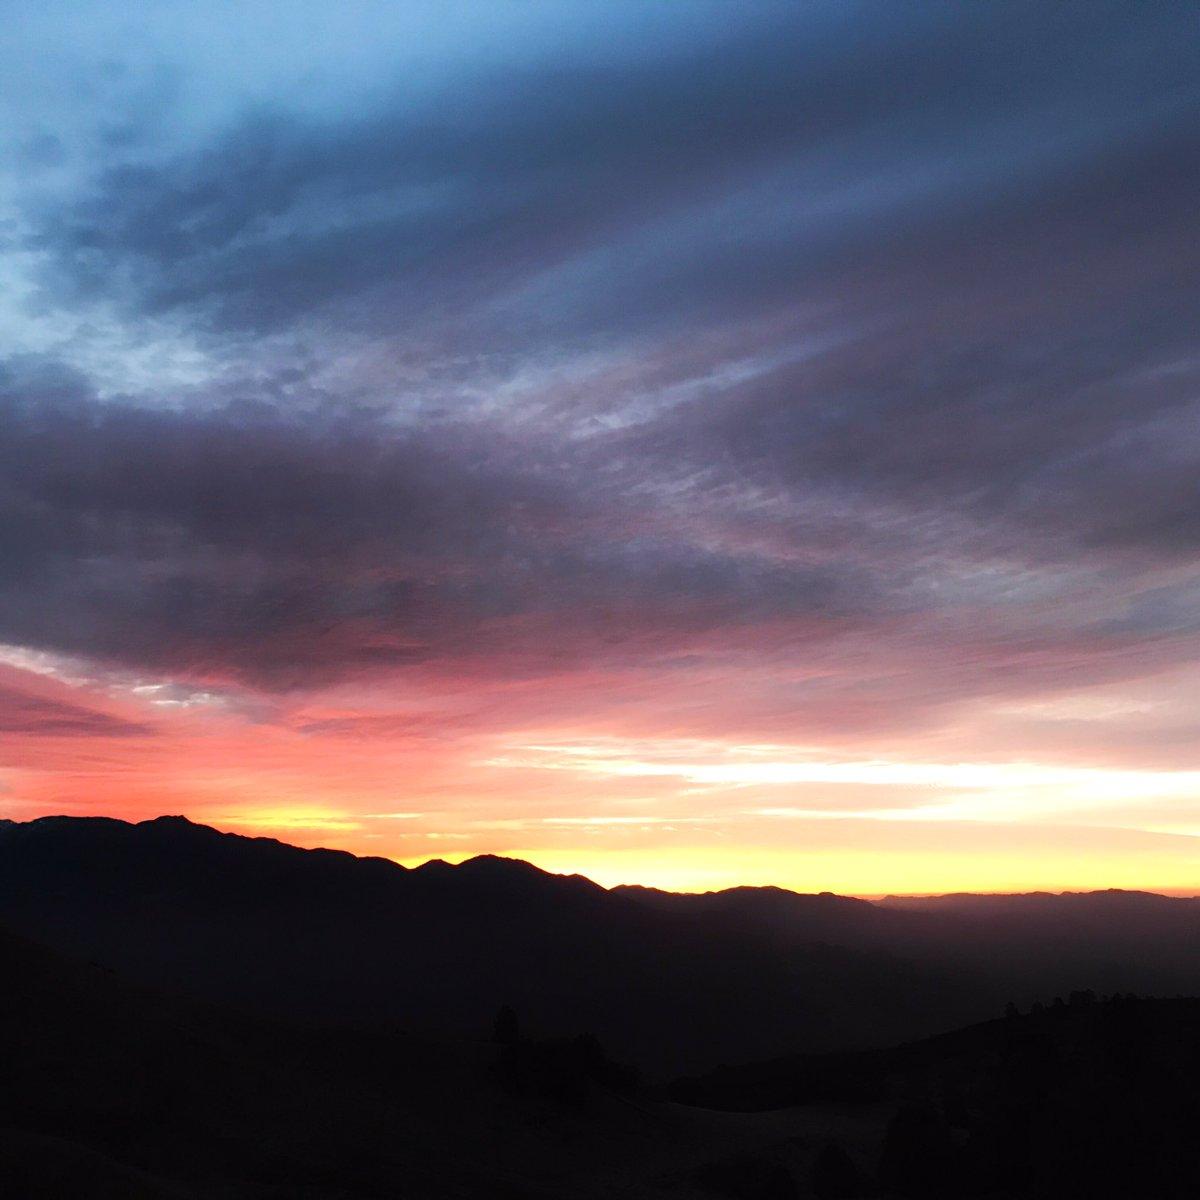 Lightening Up. #santaynezvalley #sunrise https://t.co/aOYLfAgaee